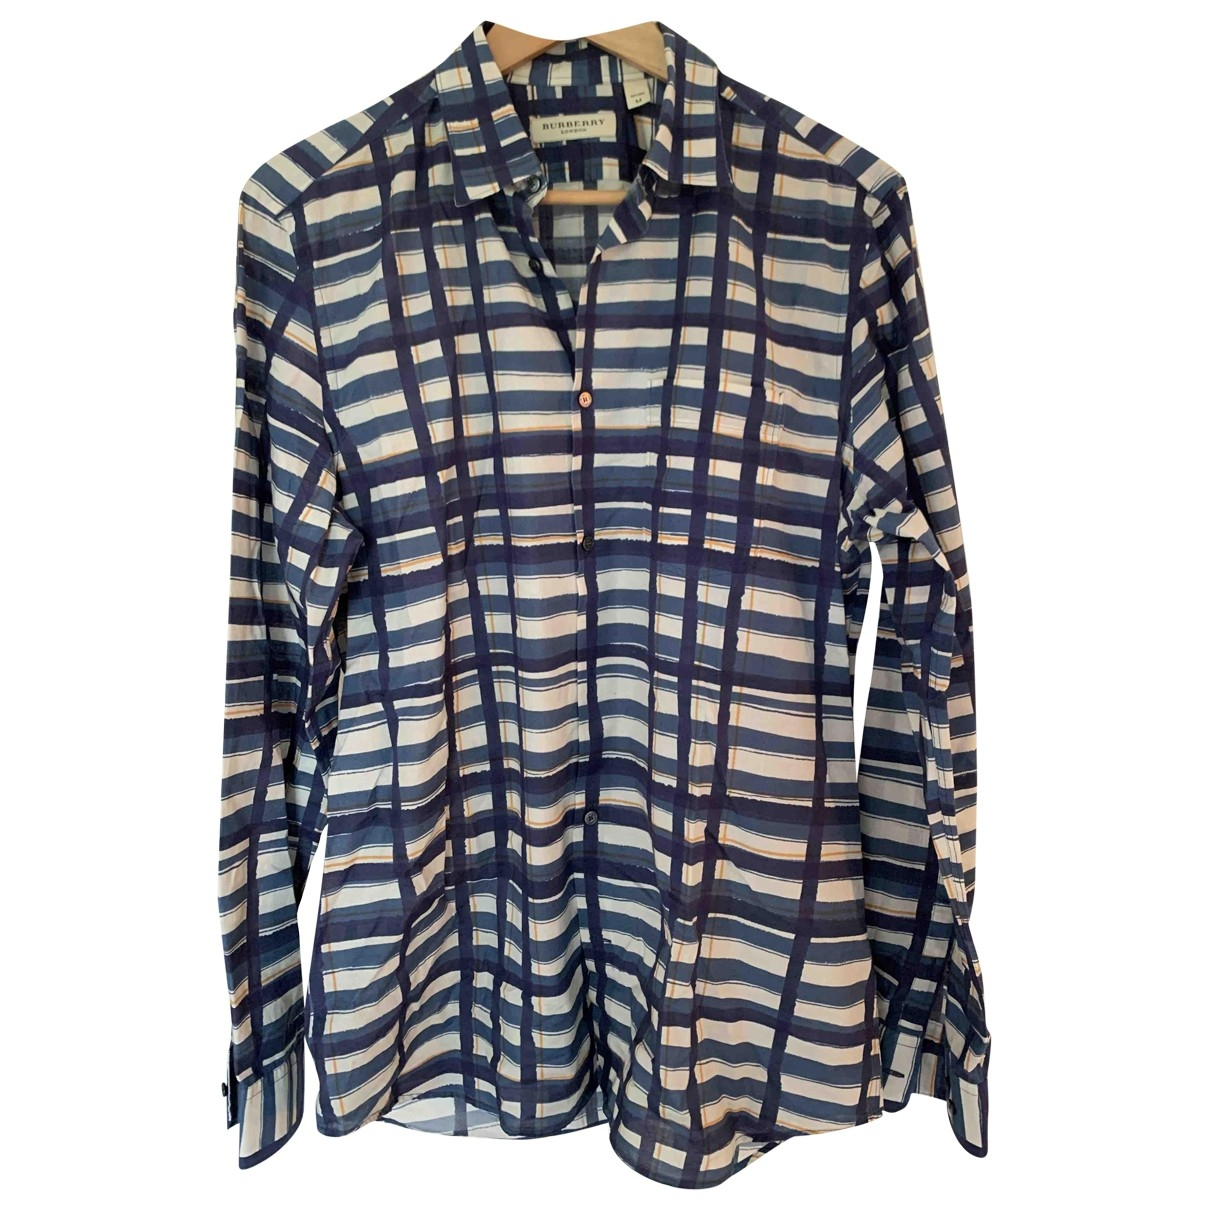 Burberry \N Multicolour Cotton Shirts for Men M International